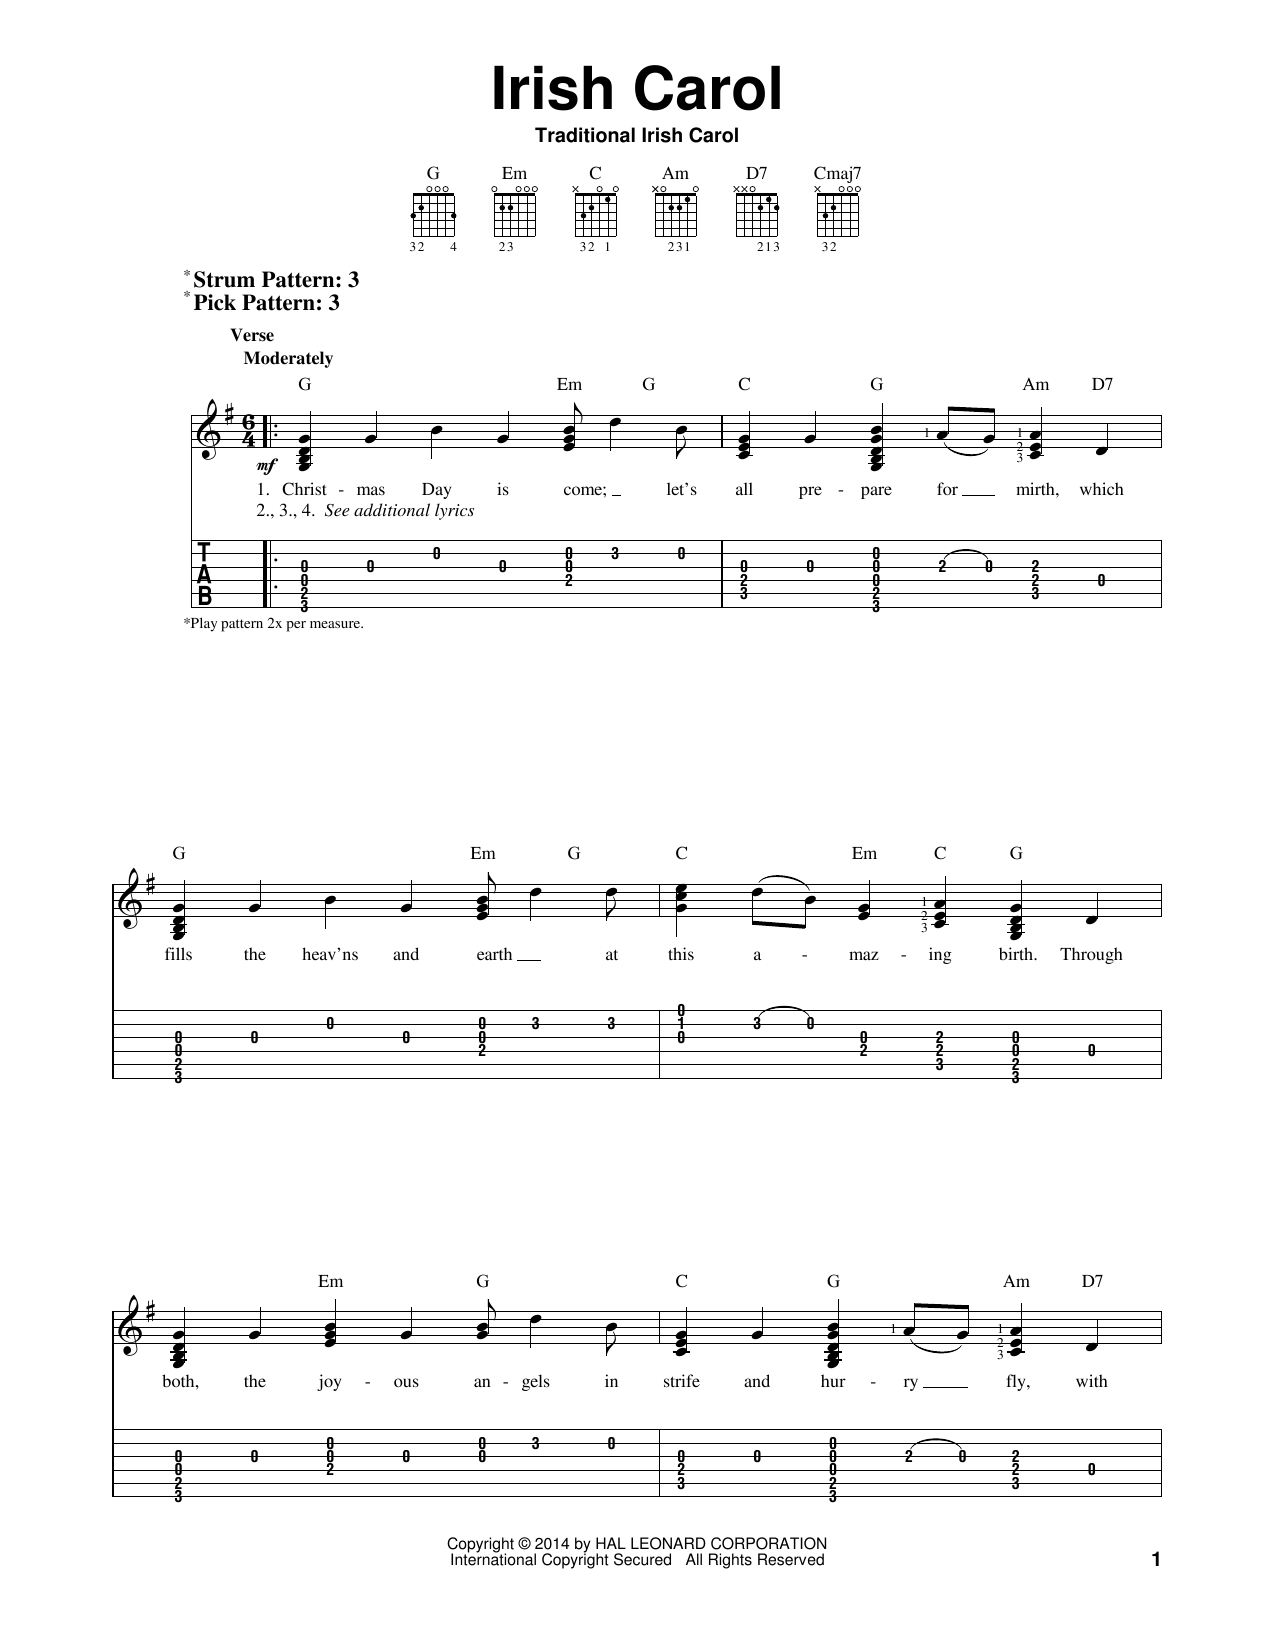 Traditional Irish Carol Irish Carol sheet music notes and chords